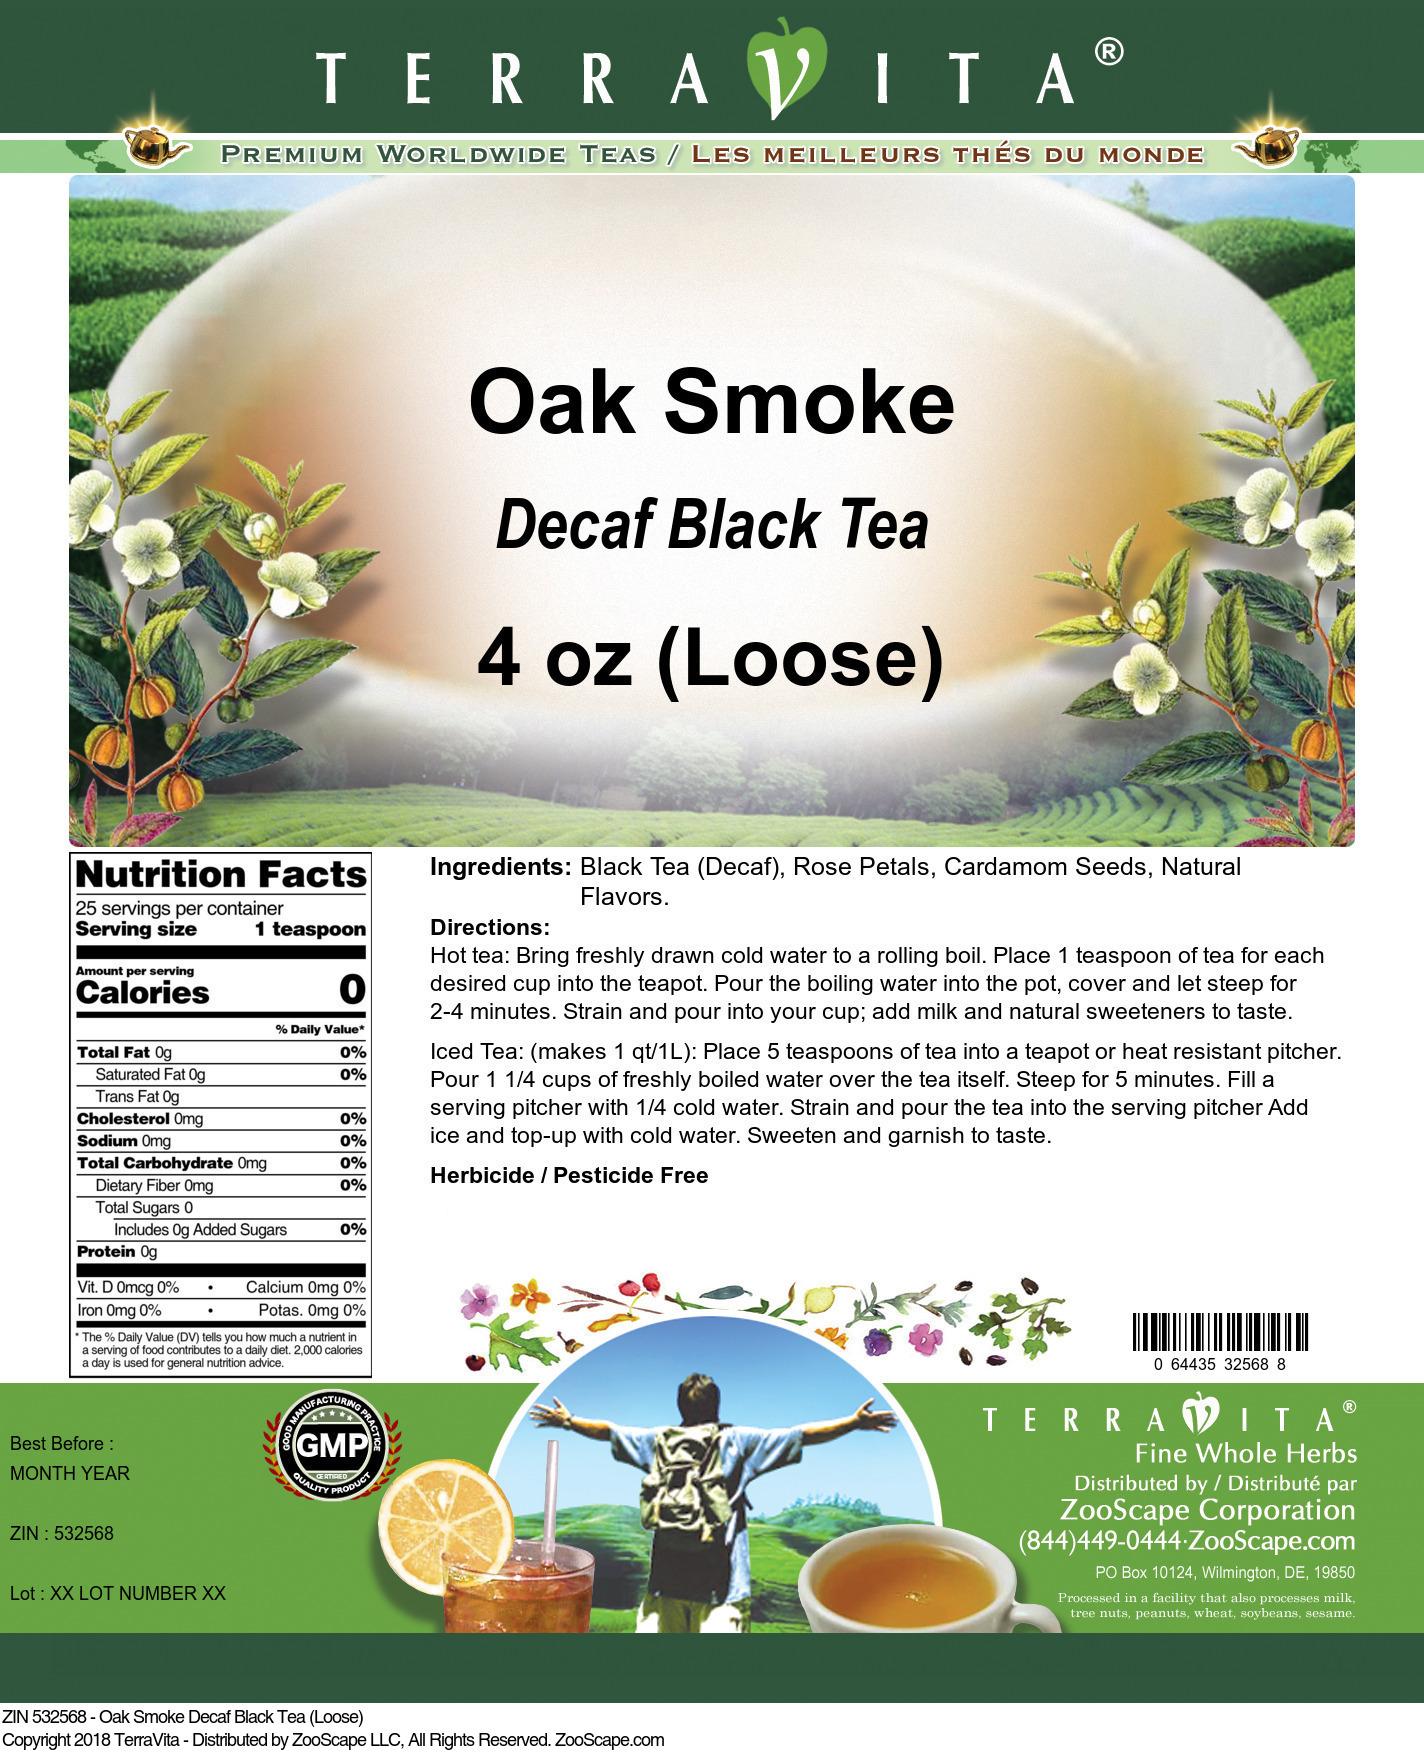 Oak Smoke Decaf Black Tea